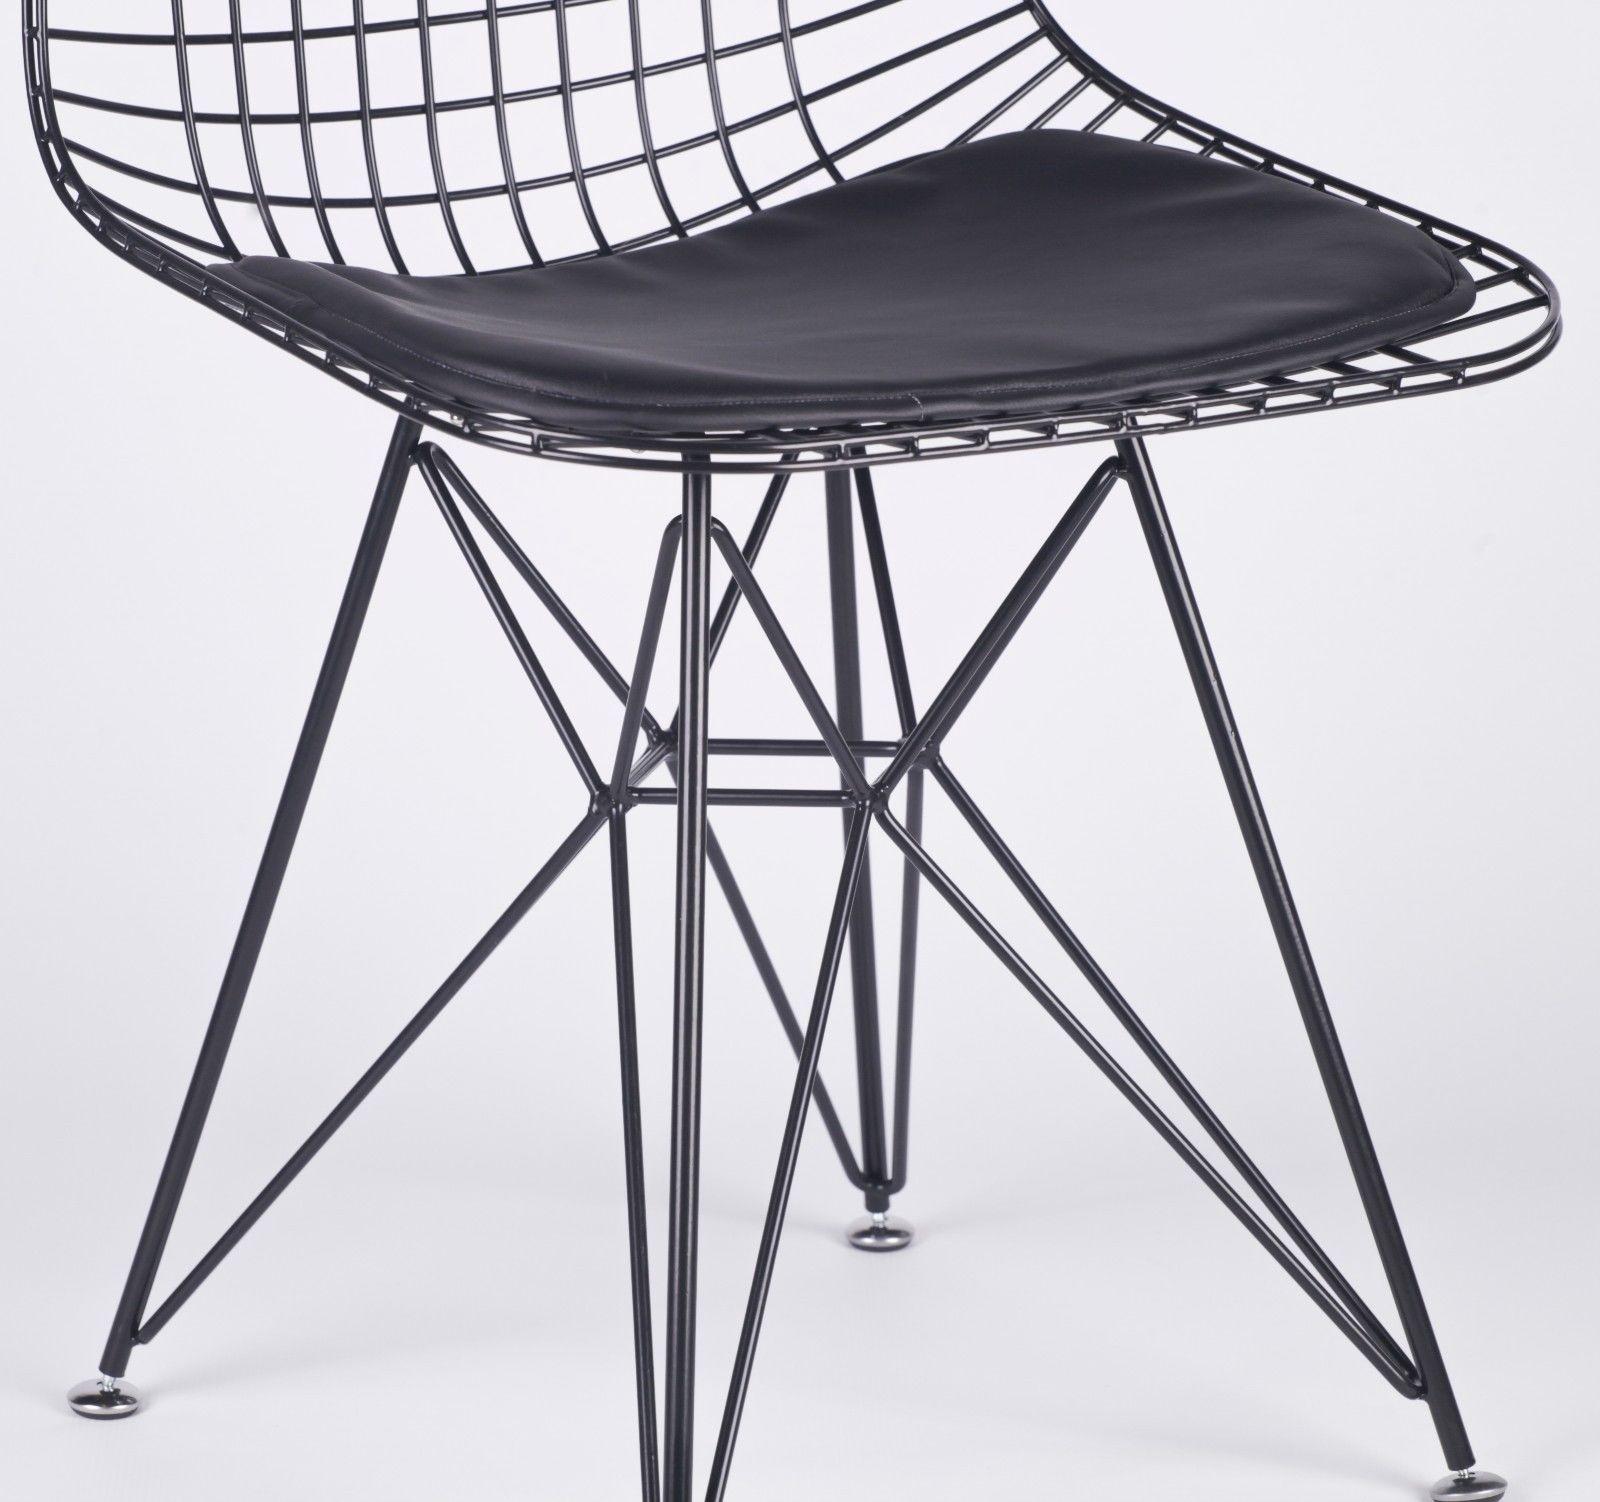 Black Mesh Eiffel Style Wire Dining Chair Furniture - La Maison Chic ...